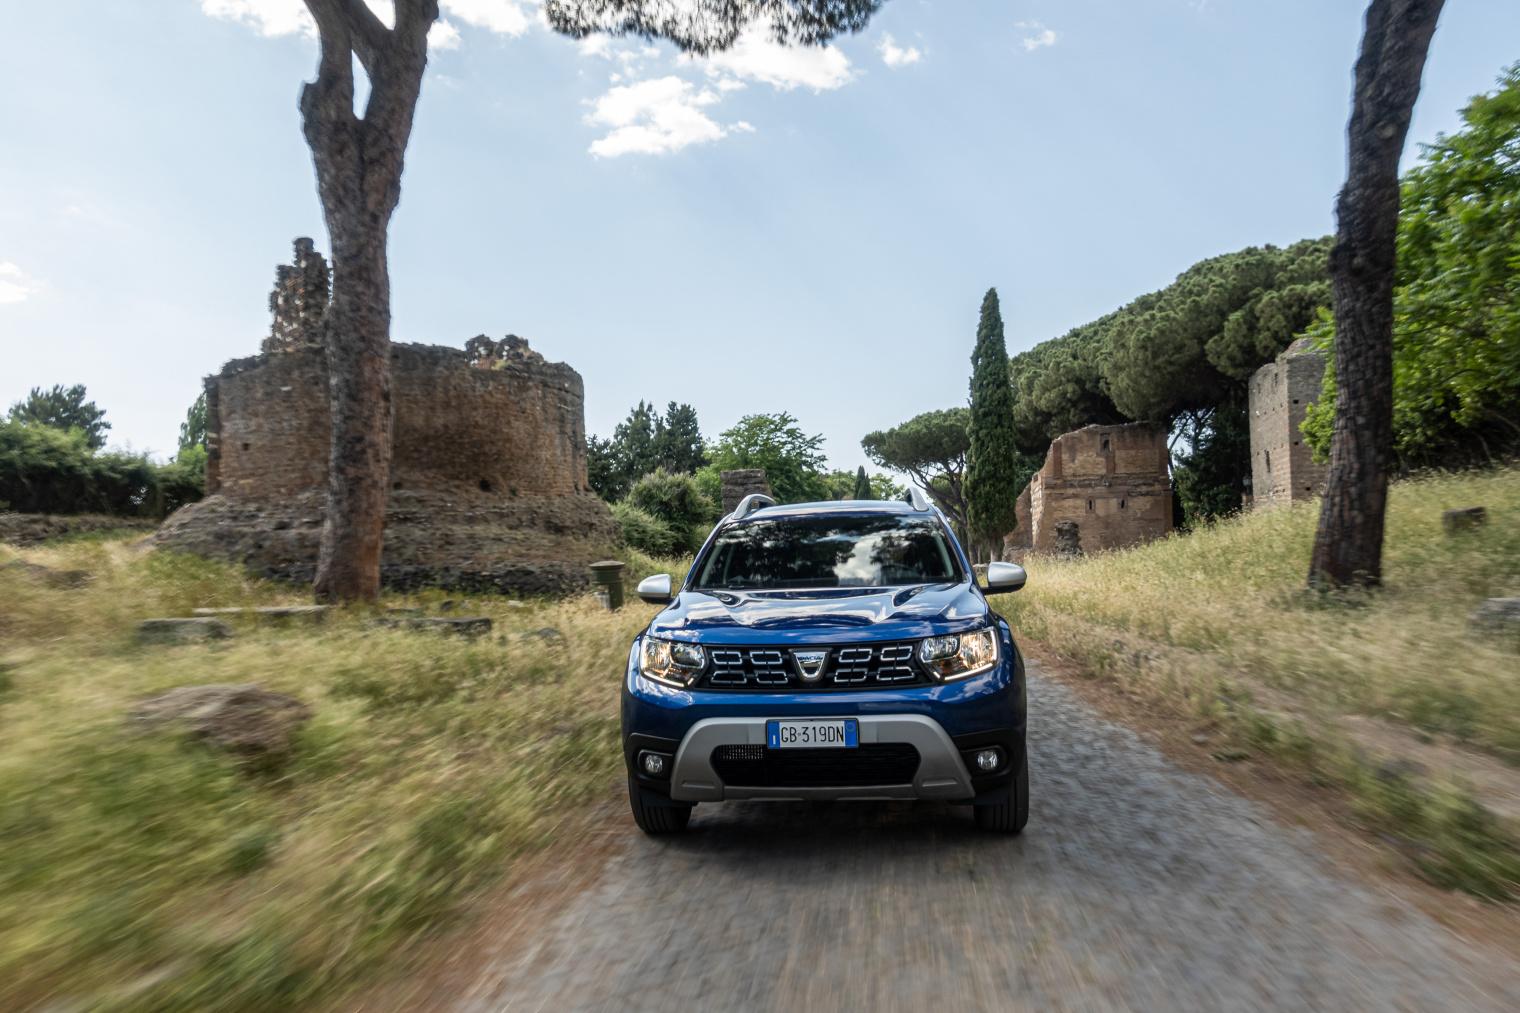 Esterni-nuova-Dacia-Duster-GPL-Turbo